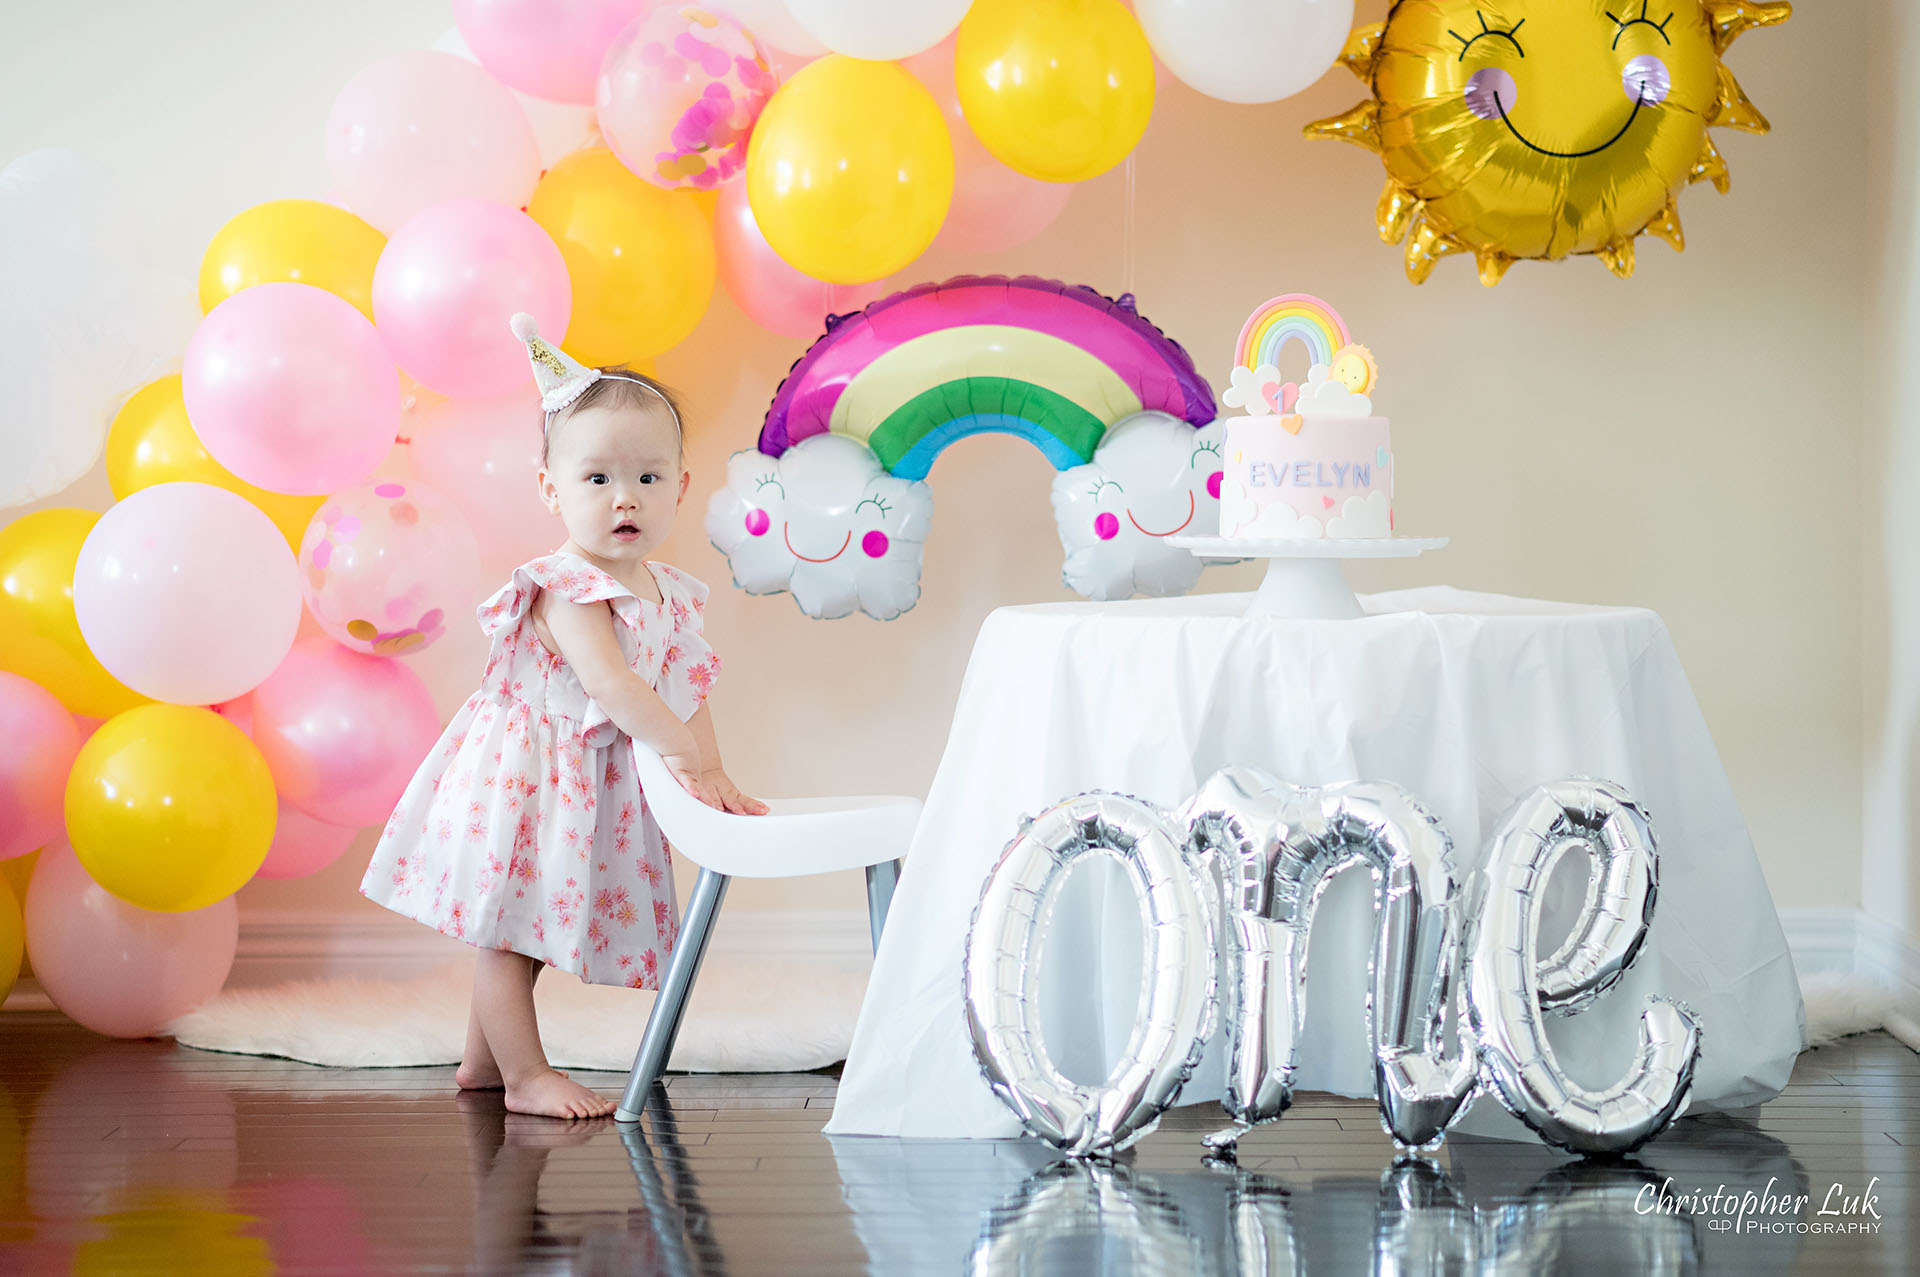 Christopher Luk Toronto Markham Family Photographer Baby Girl First Birthday Balloon Arch Rainbow Pink Hat Rainbow Sun Cake